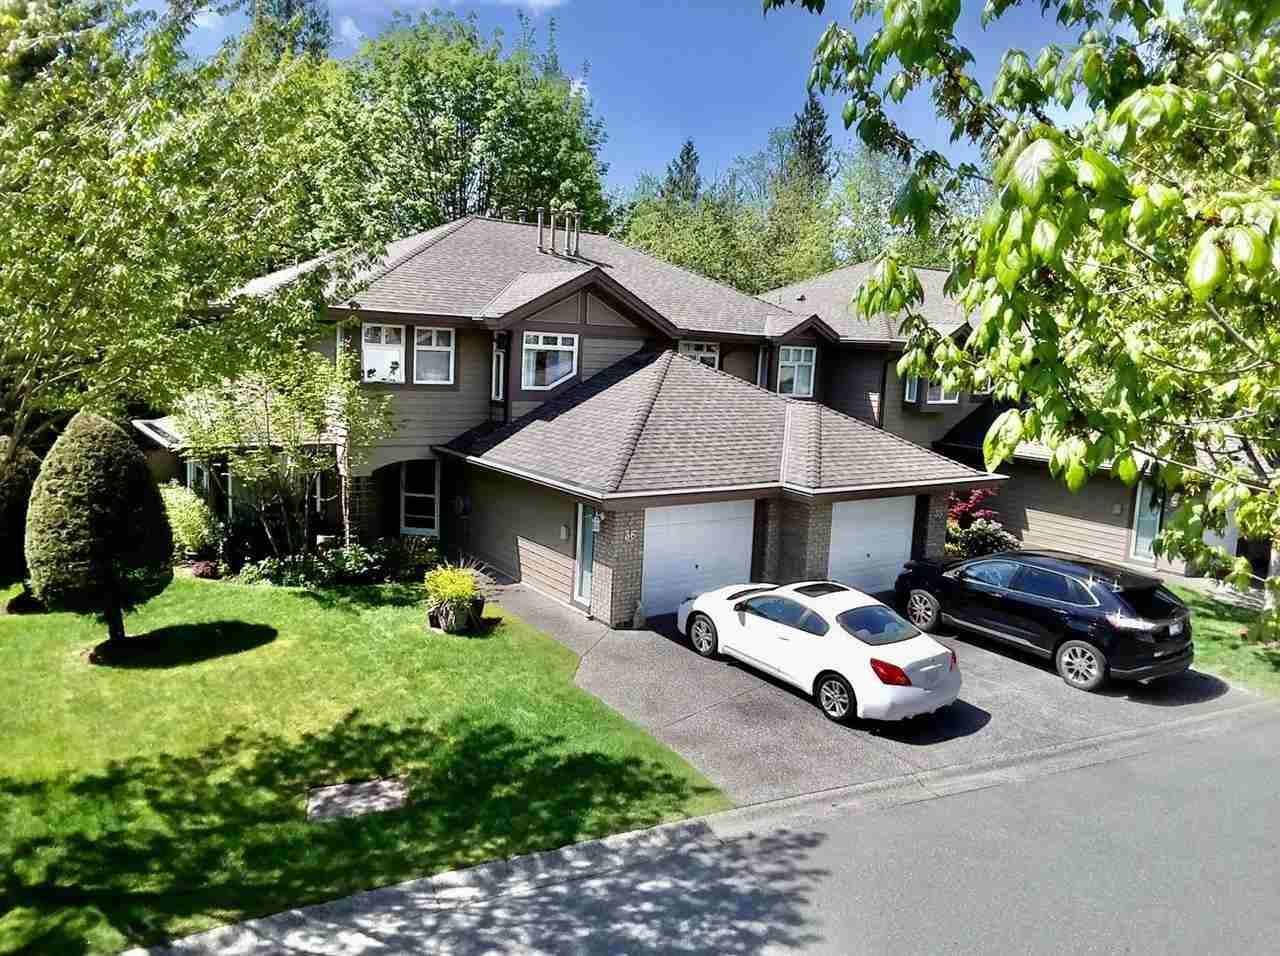 Main Photo: 36 11737 236 Street in Maple Ridge: Cottonwood MR Townhouse for sale : MLS®# R2576614